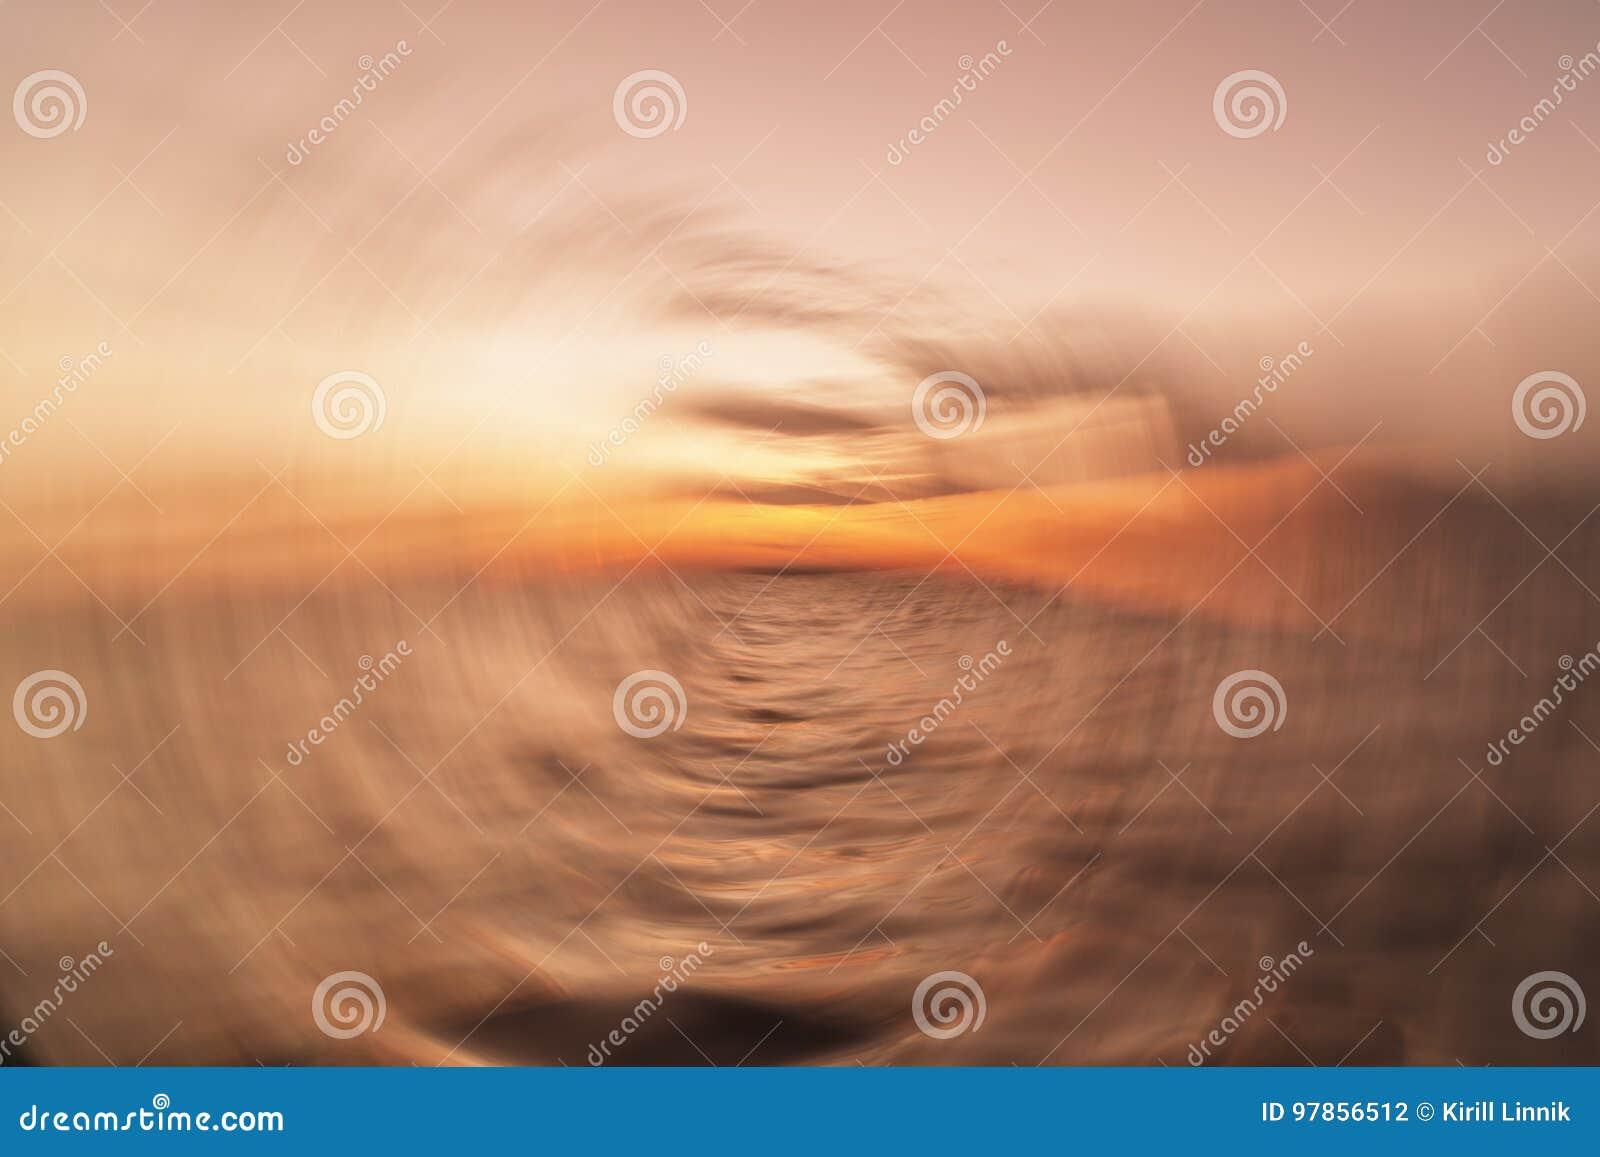 Download Illustration of a seasick stock photo. Image of bali - 97856512